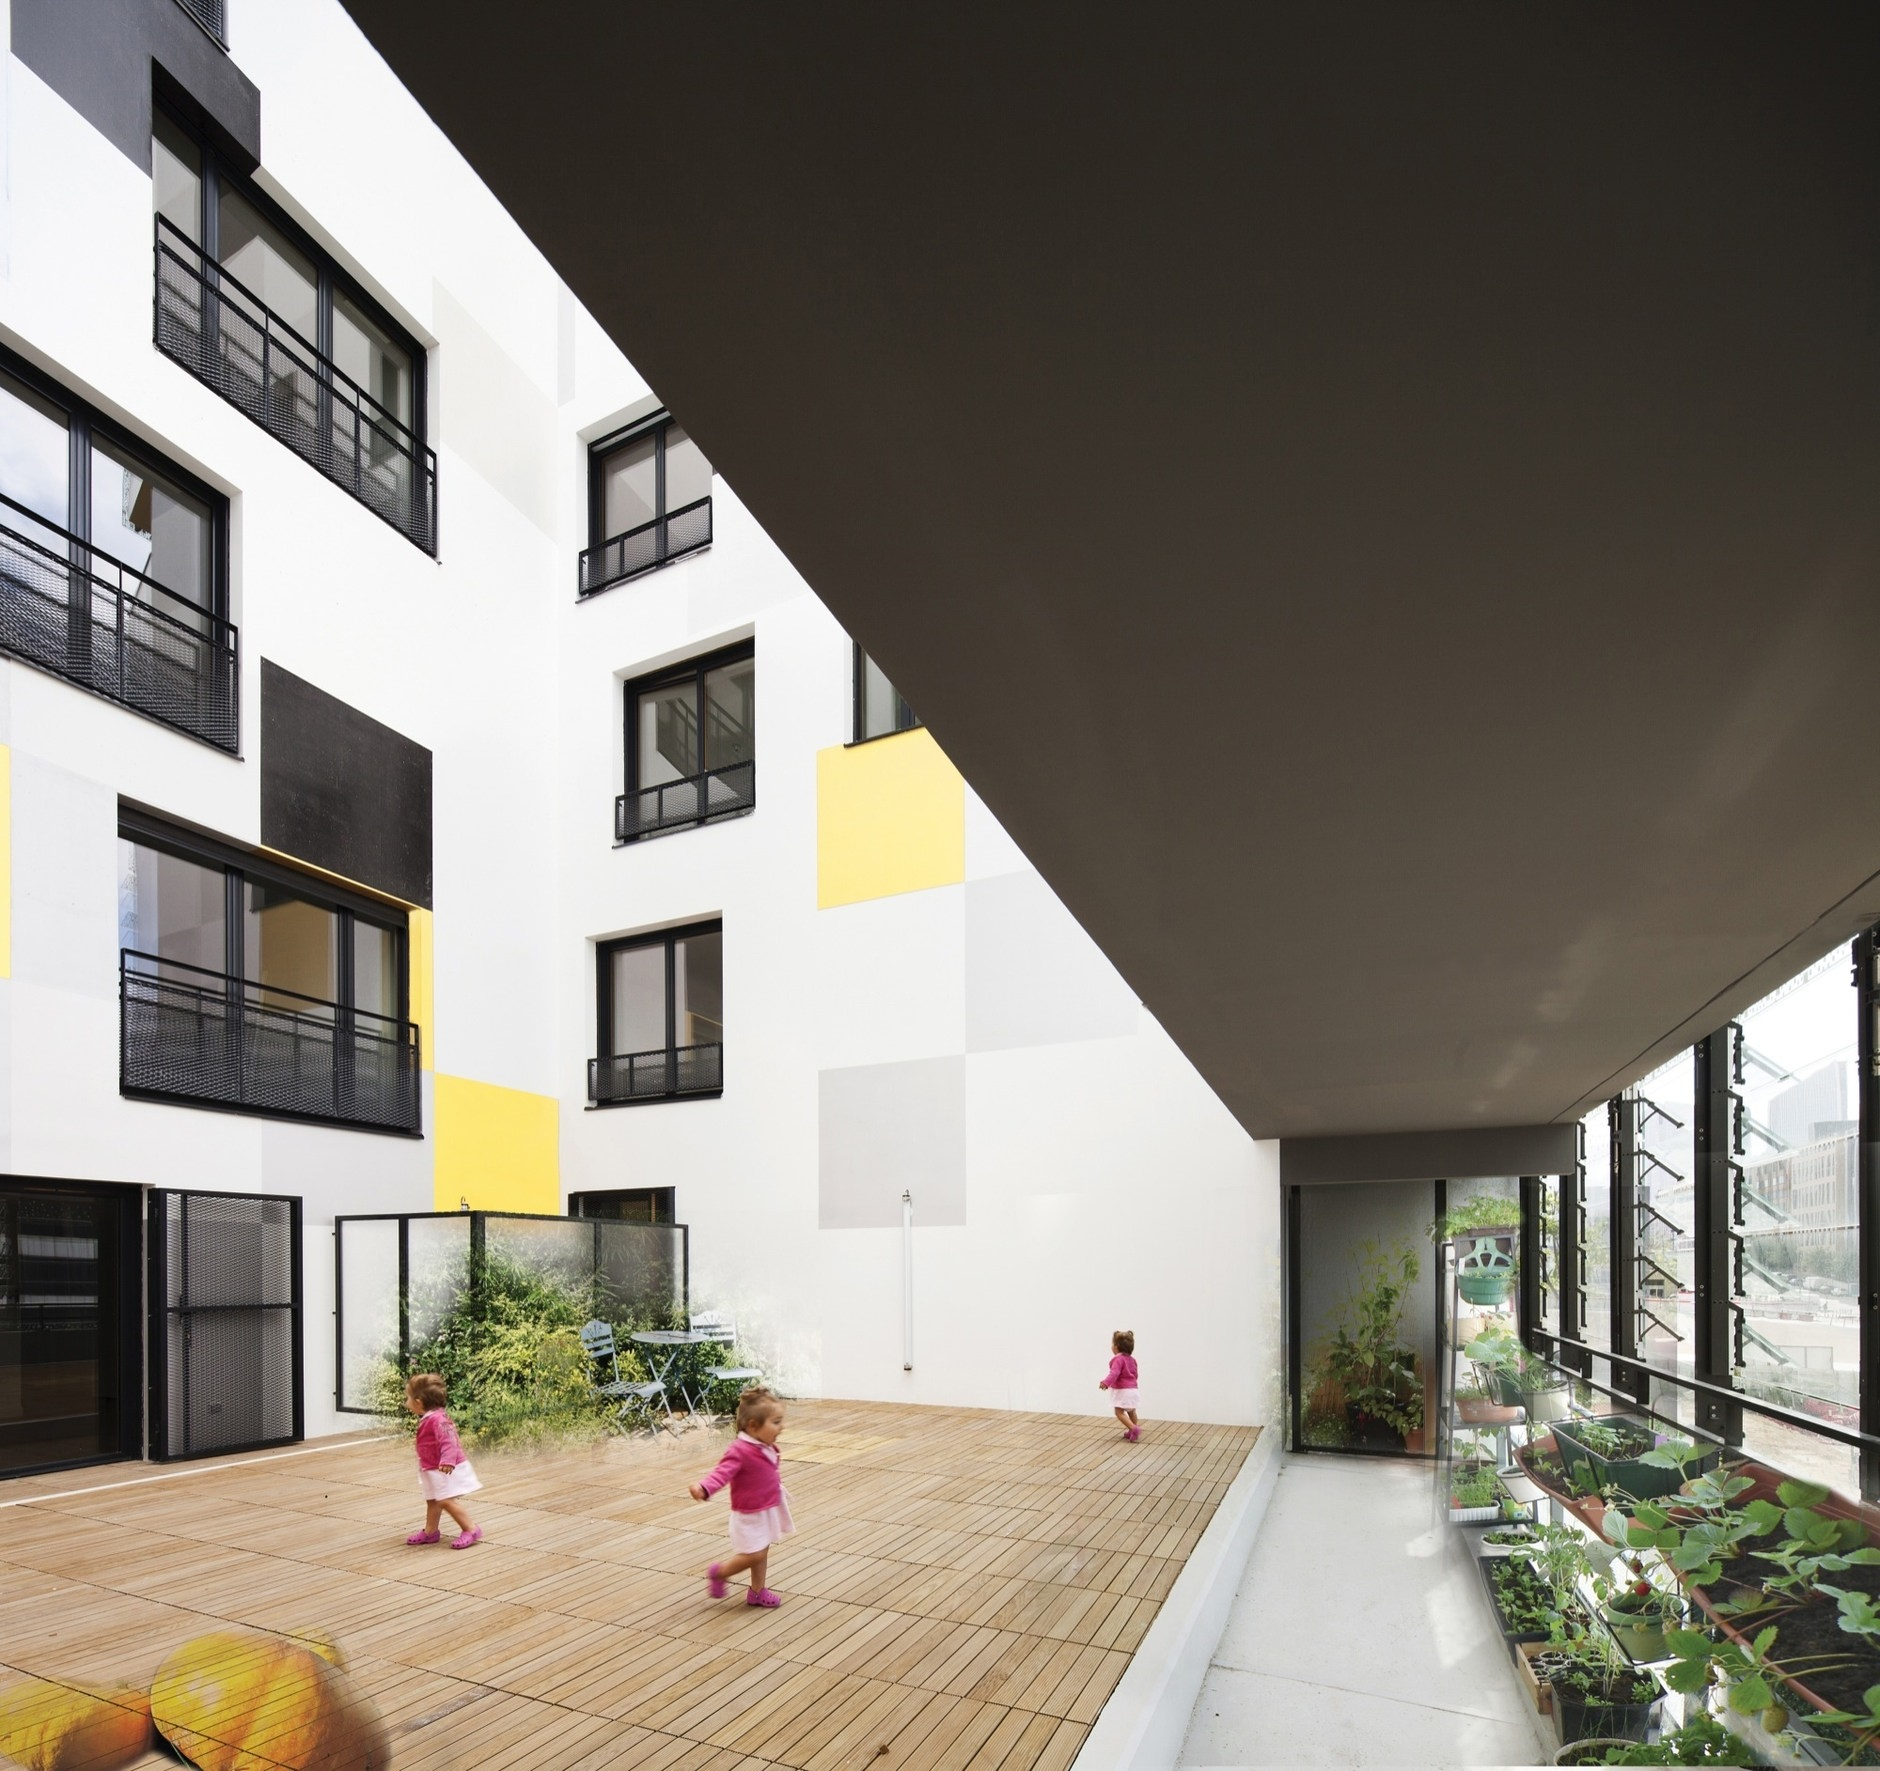 Apartment Block: Apartment Blocks In Nanterre By X-TU